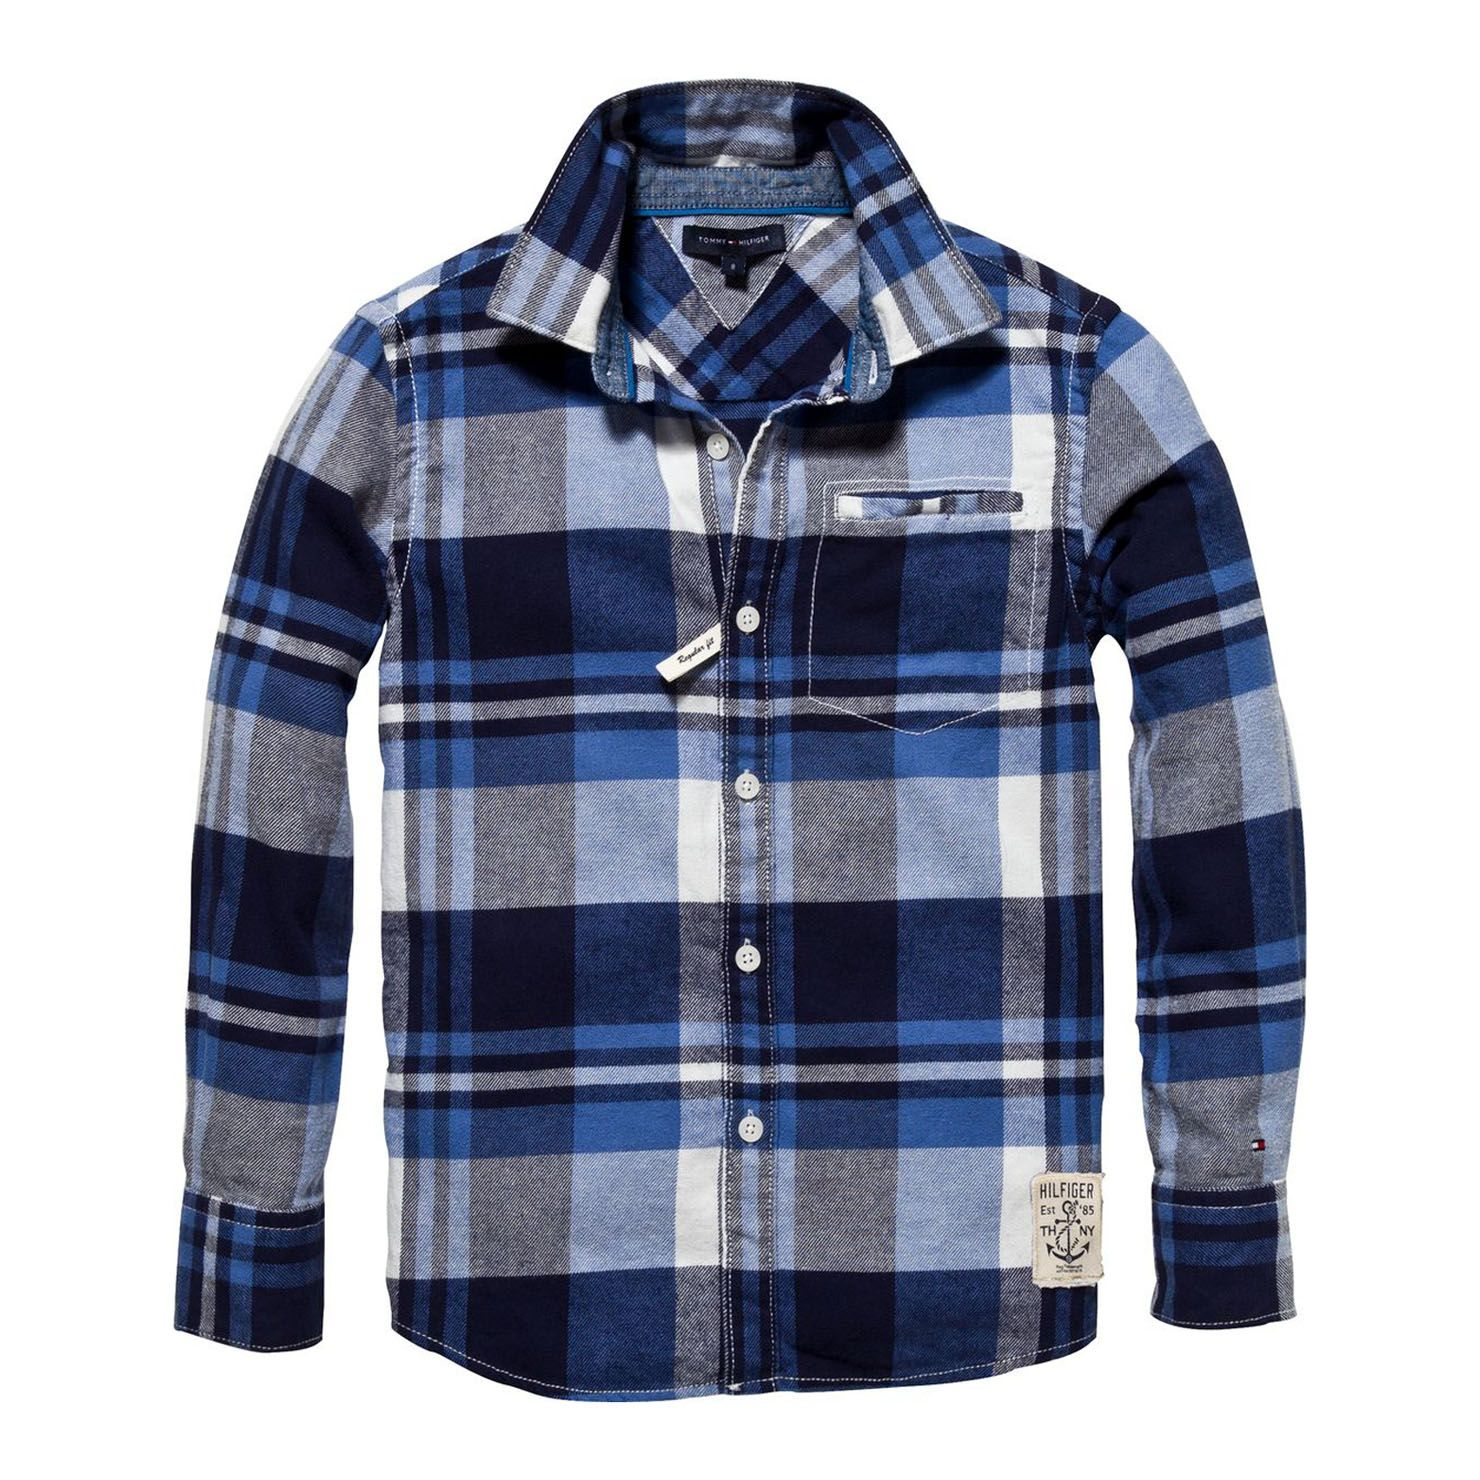 Tommy Hilfiger Fall River Check Shirt - Black Iris   Children s ... e6cad3dc35